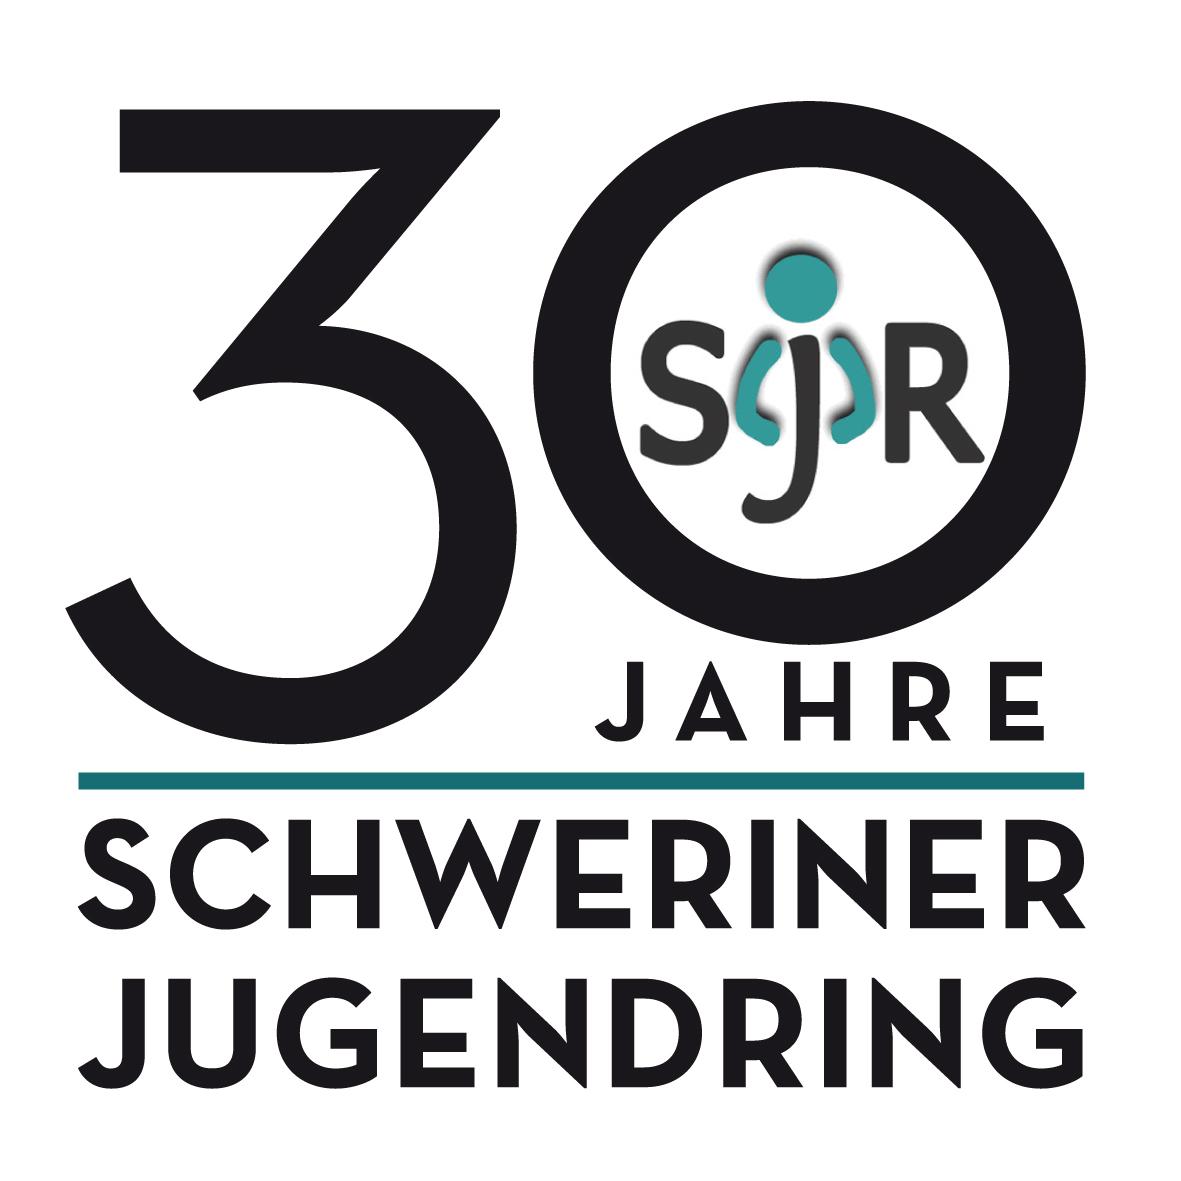 Schweriner Jugendring e.V.